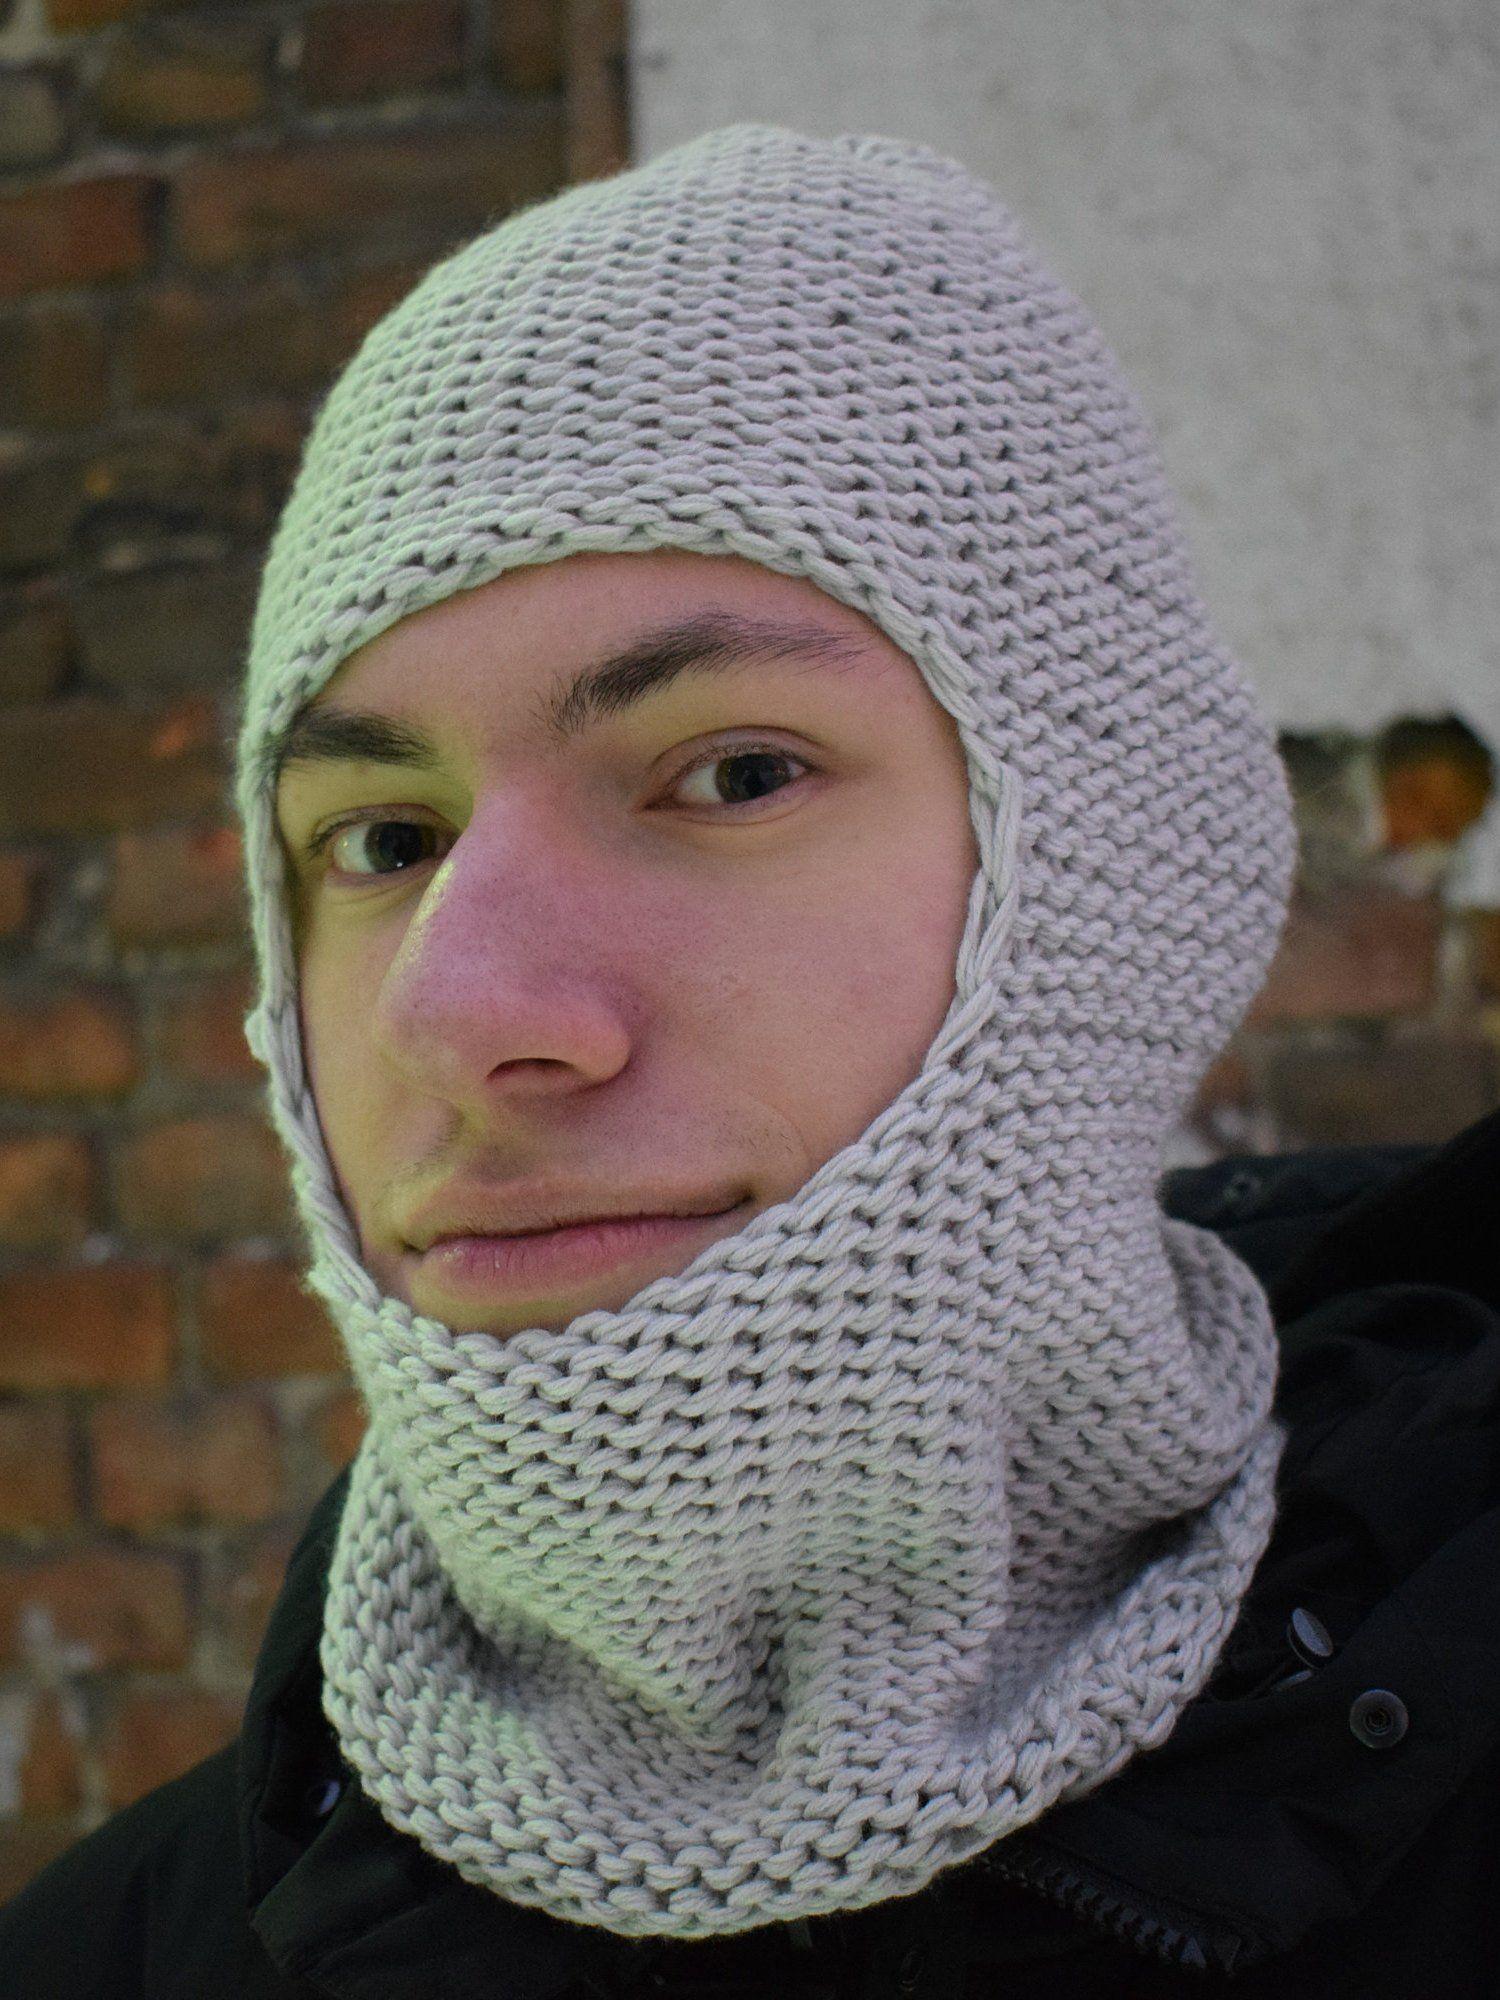 Wool ski mask balaclava winter face mask outdoor sport